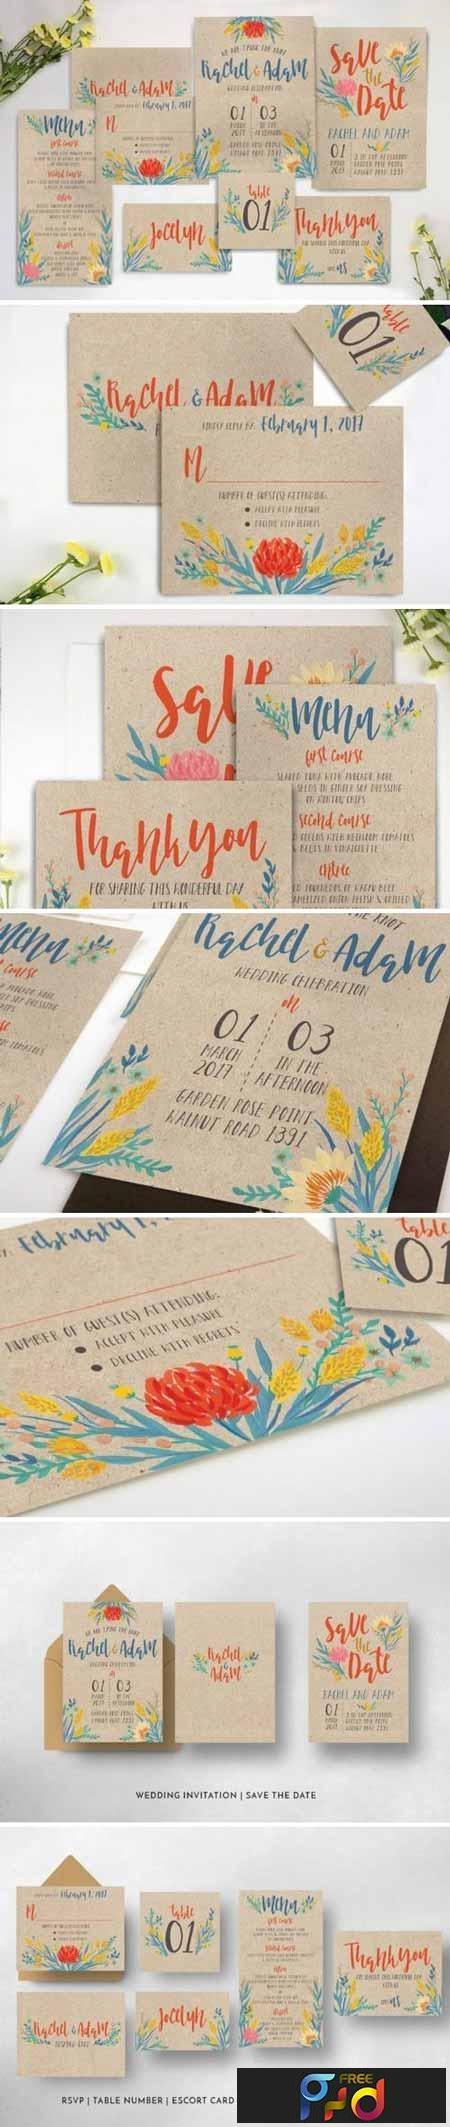 Summer Floral Wedding Invitation Suite 916717 1